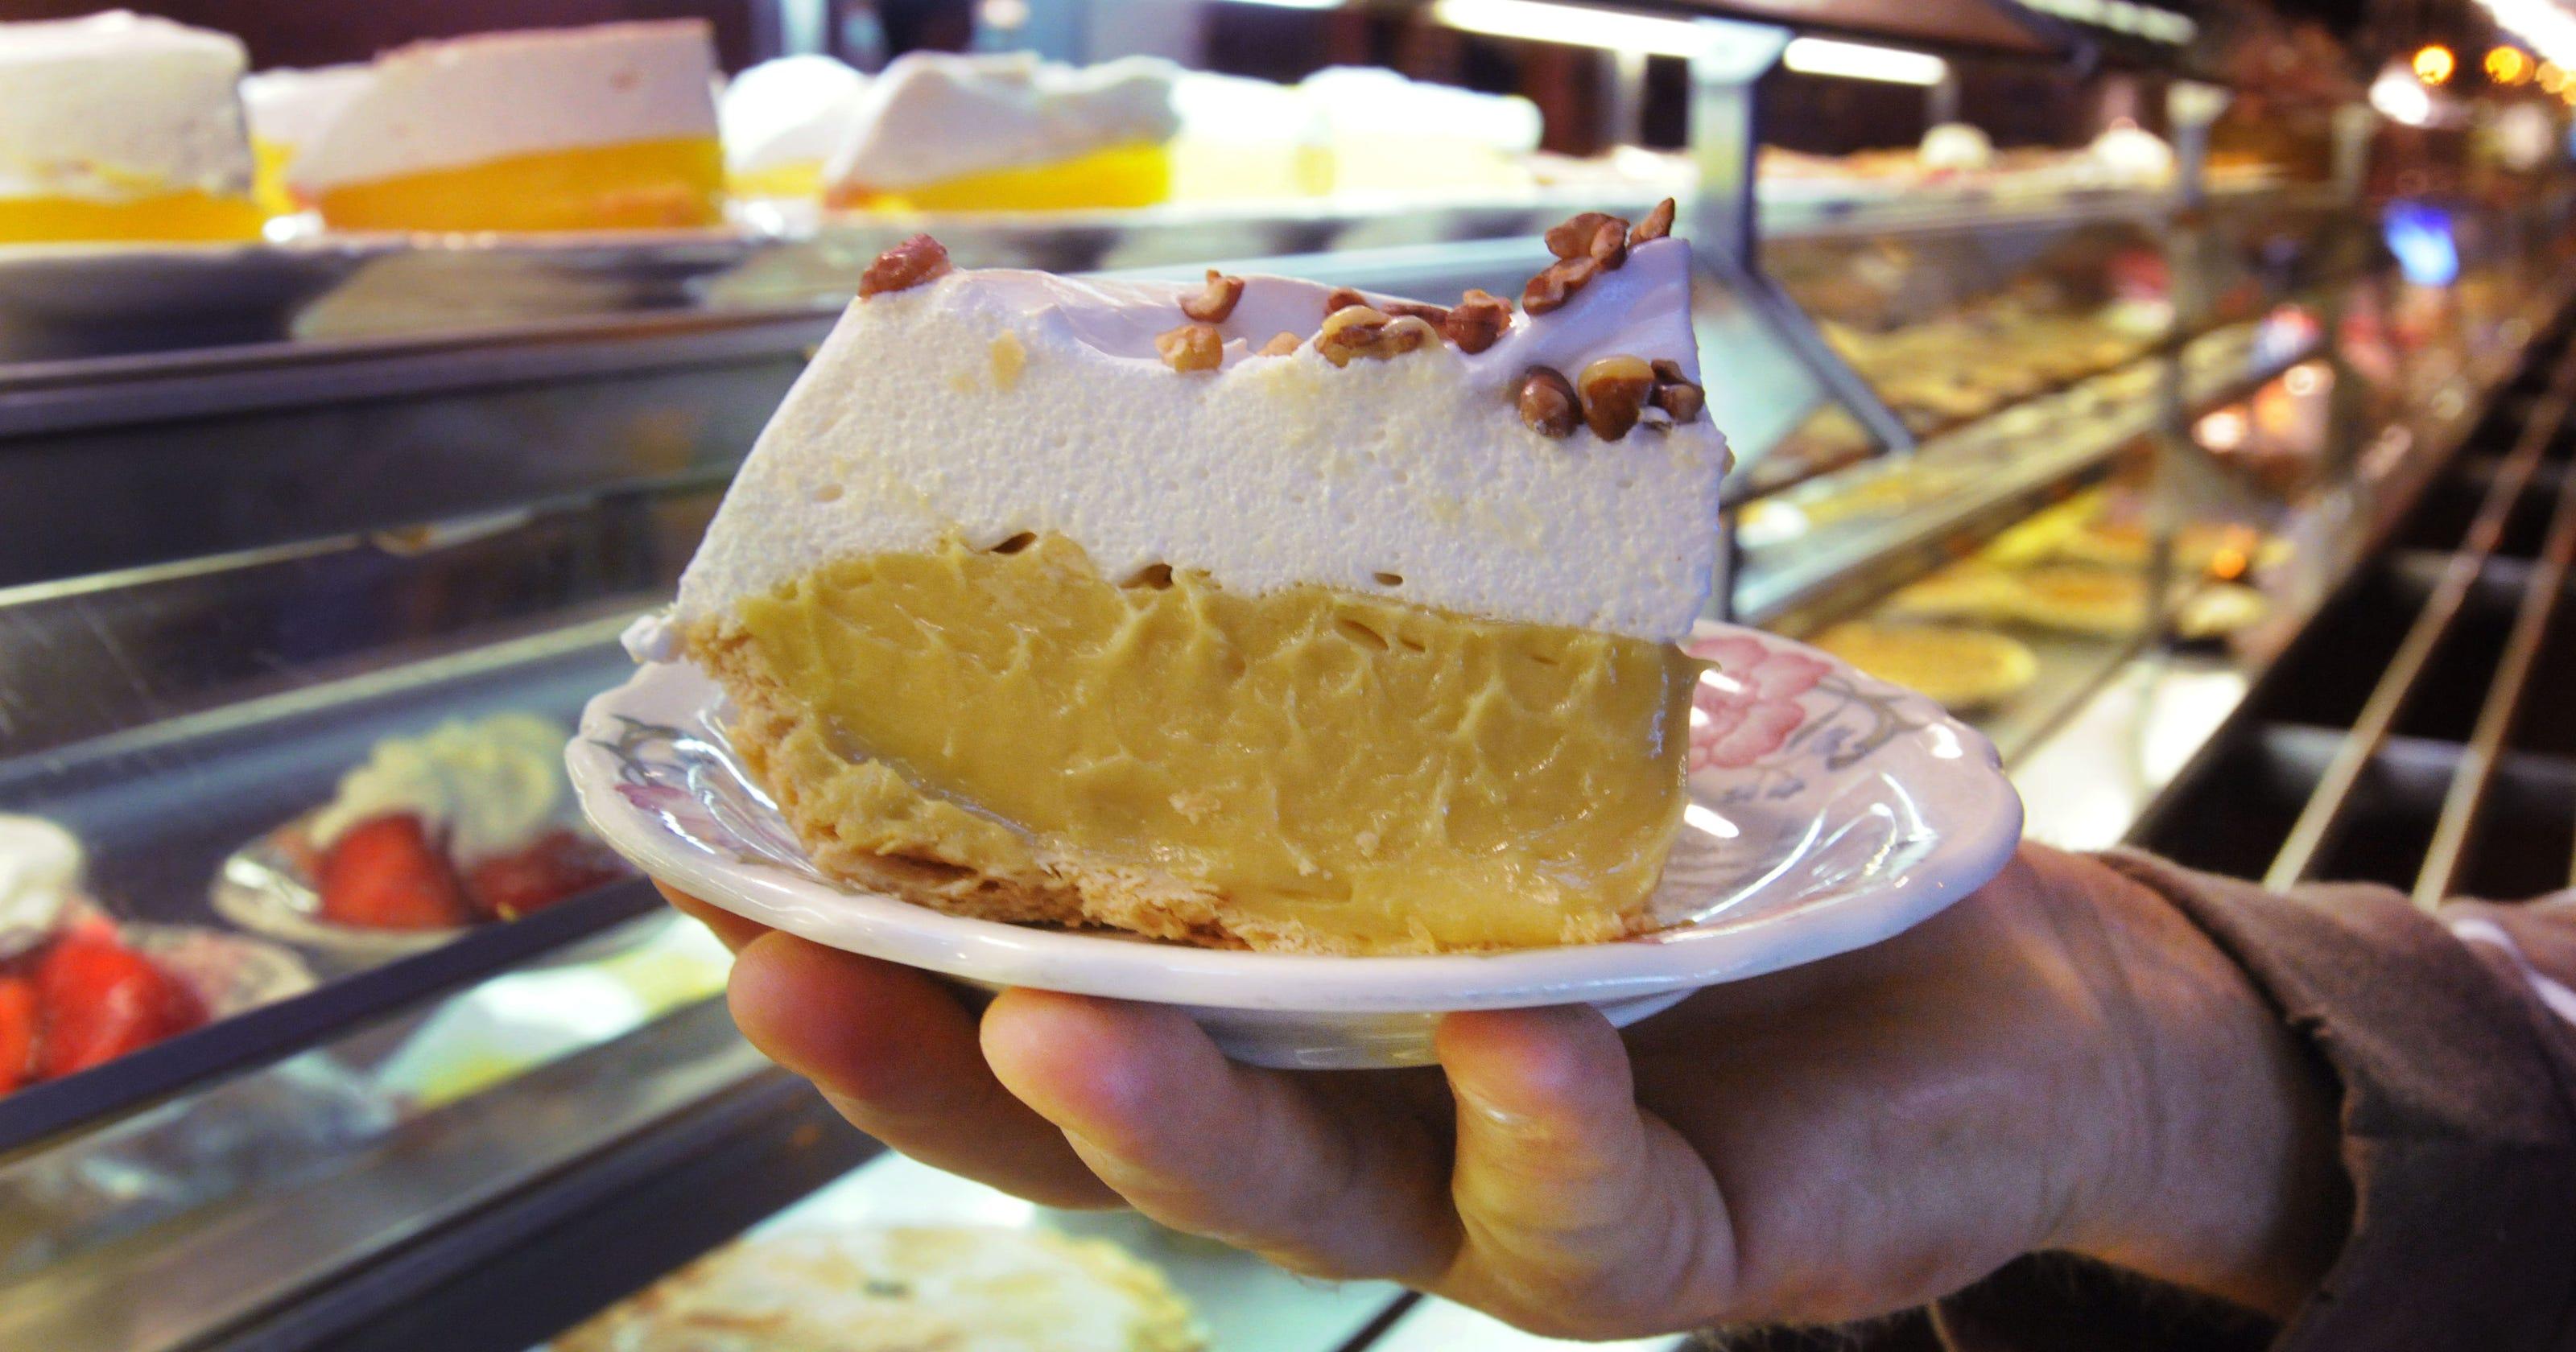 Restaurants open on Thanksgiving 2018: The 10 best around Indianapolis